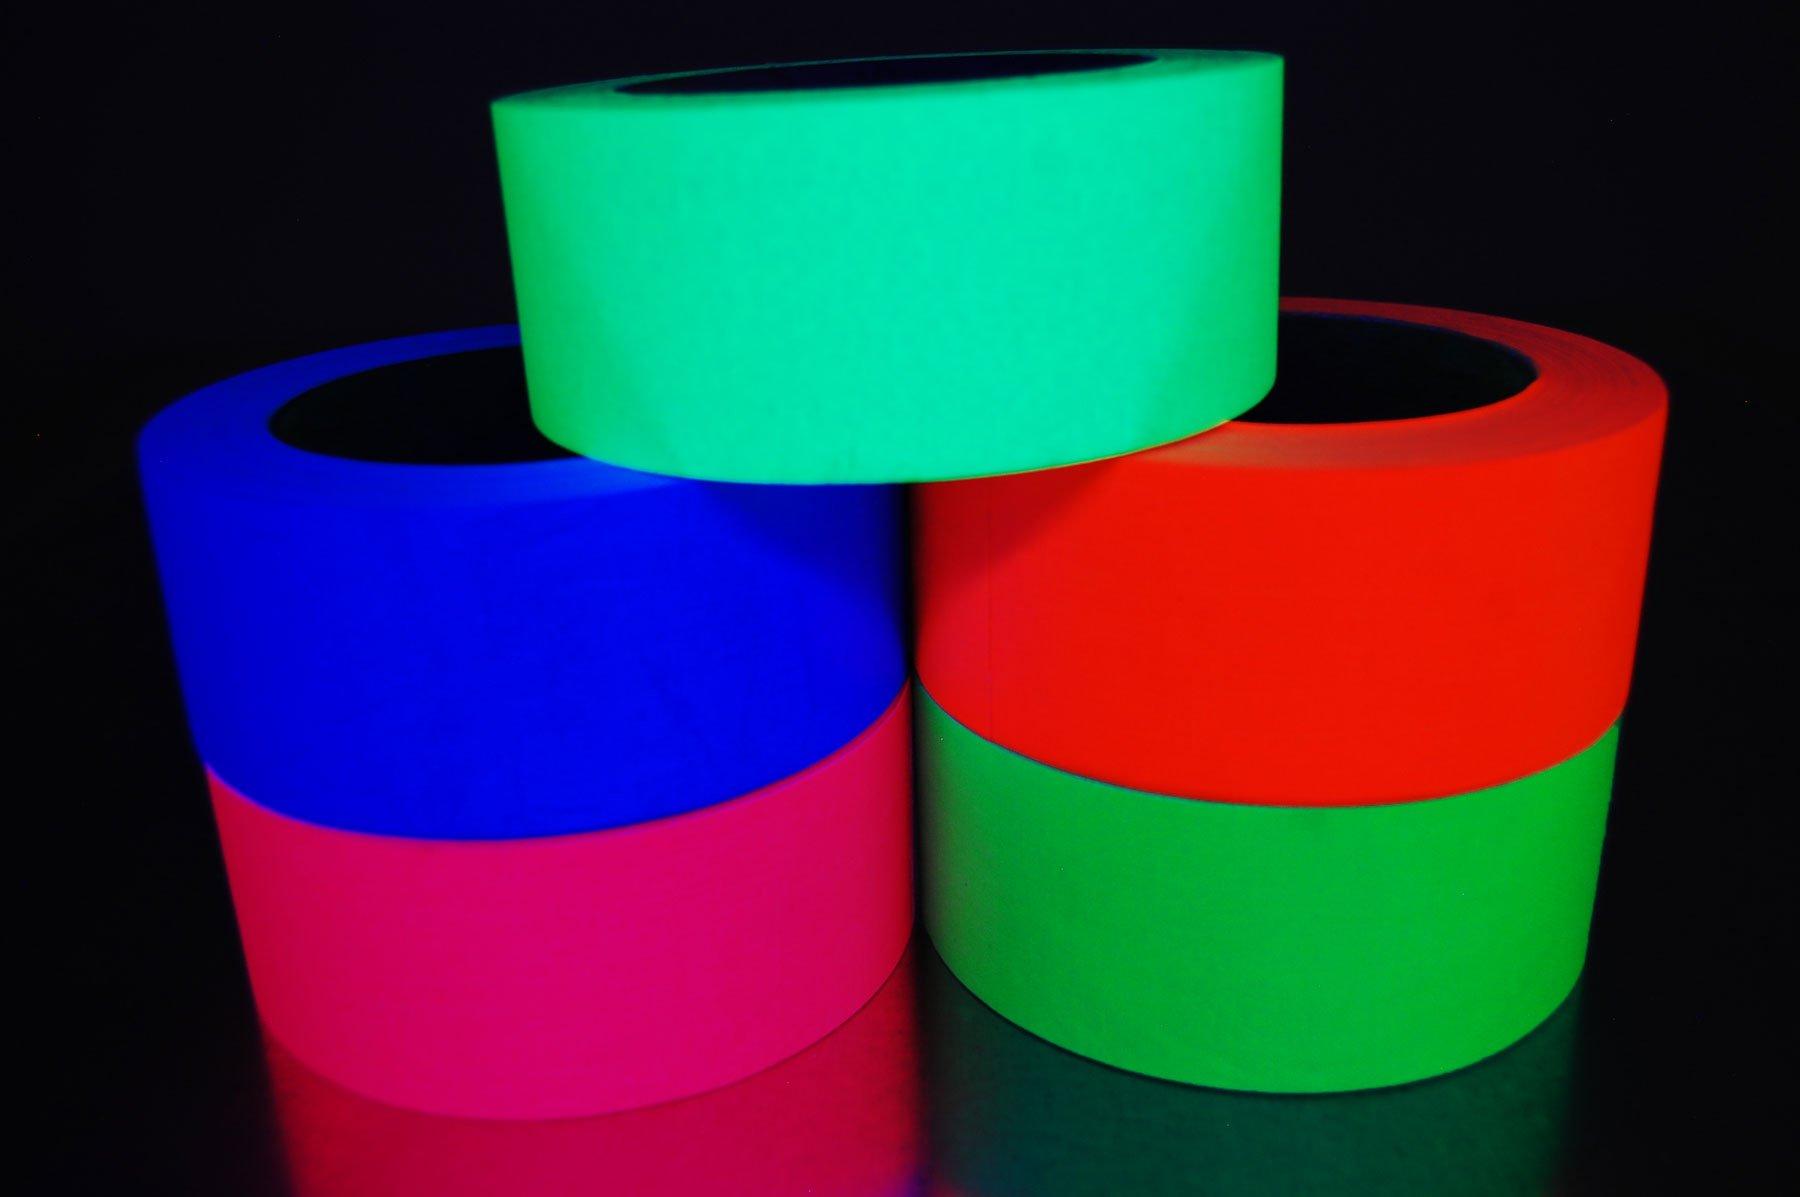 2 Inch x 25 Yards UV Blacklight Reactive Fluorescent Gaffer Tape (5 Pack 5 Rolls x 25 Yards)